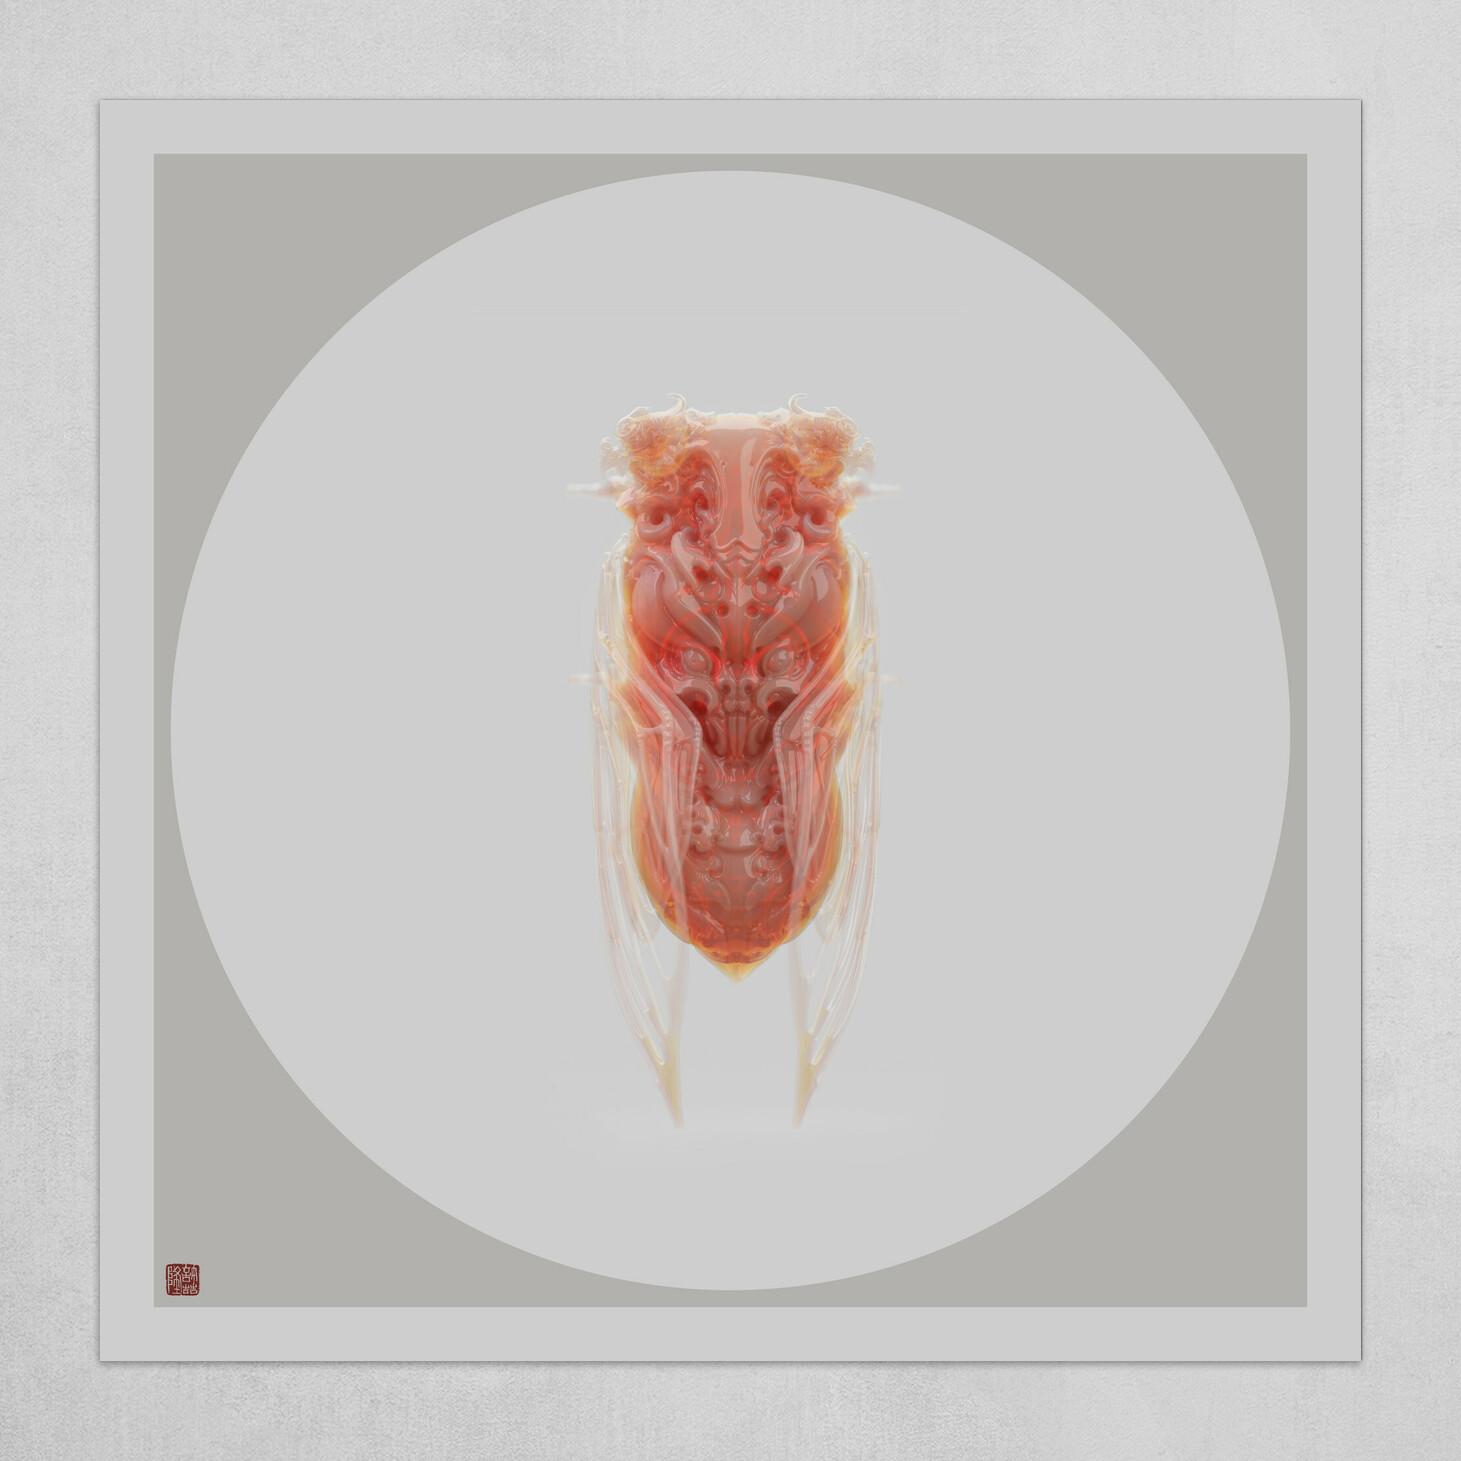 The red cicada